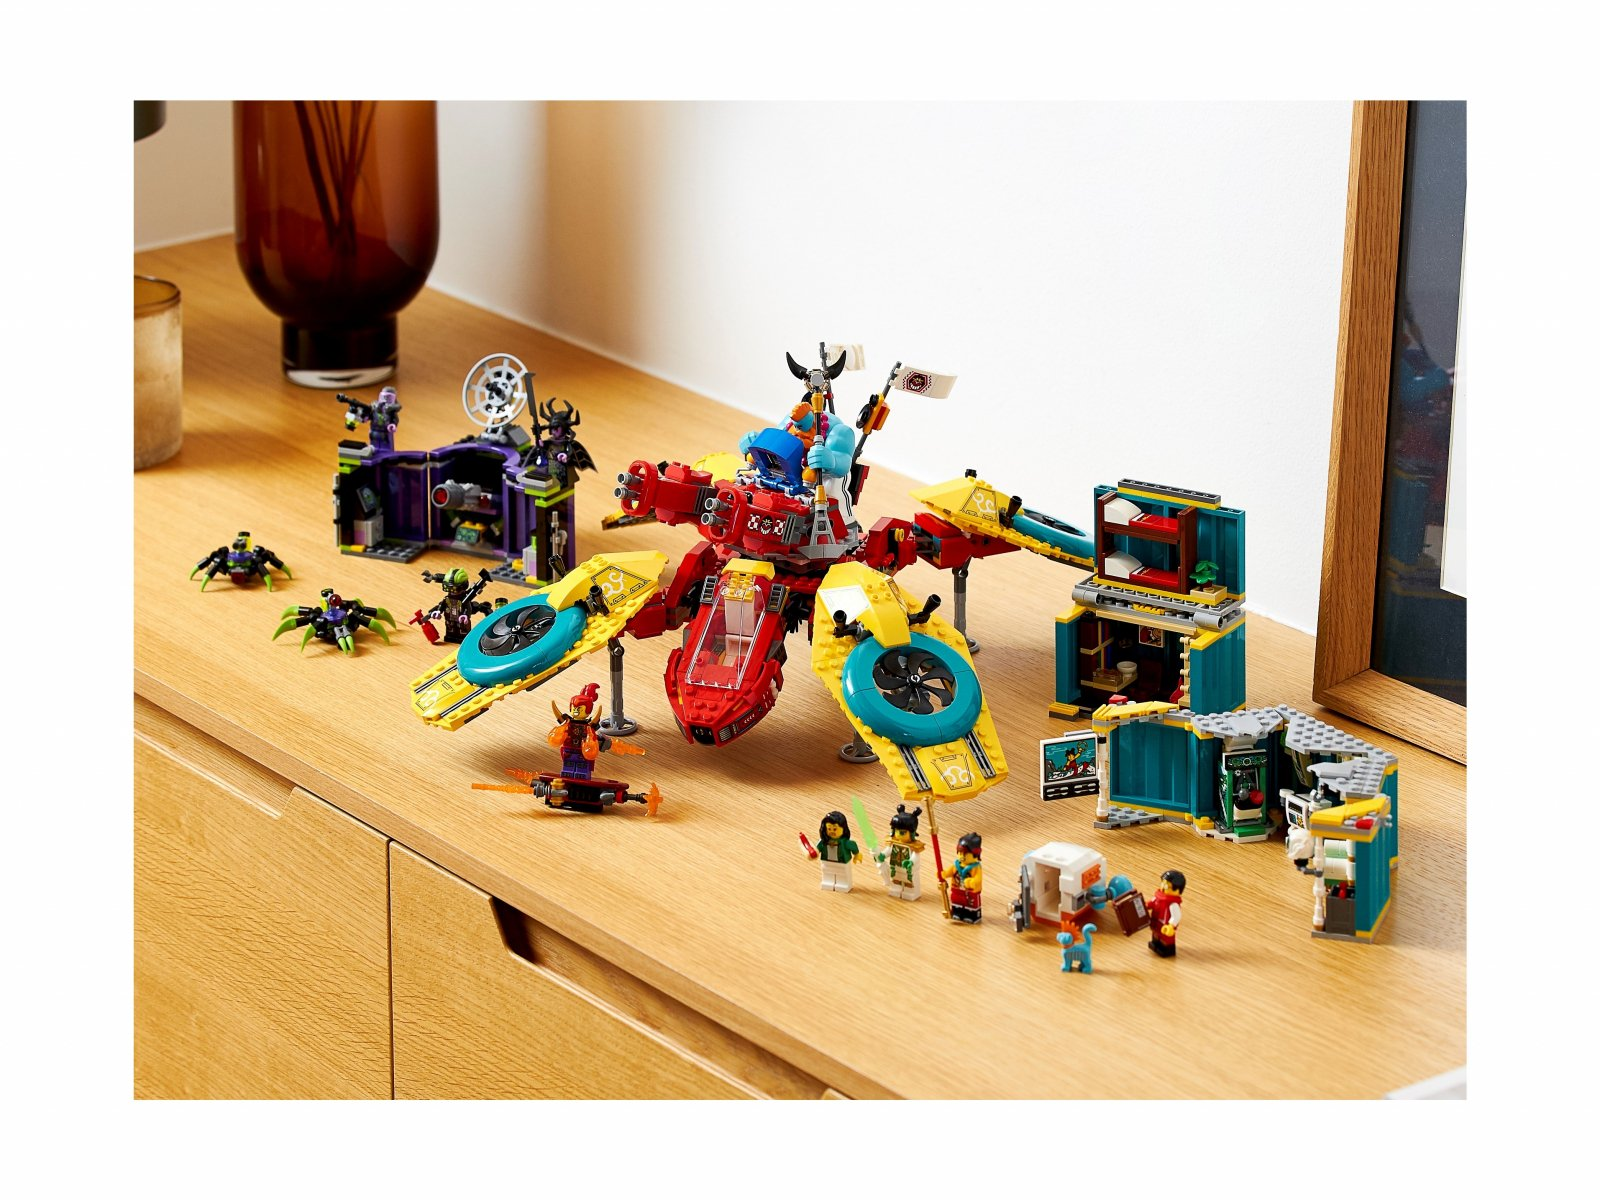 LEGO 80023 Monkie Kid Dronkopter ekipy Monkie Kida